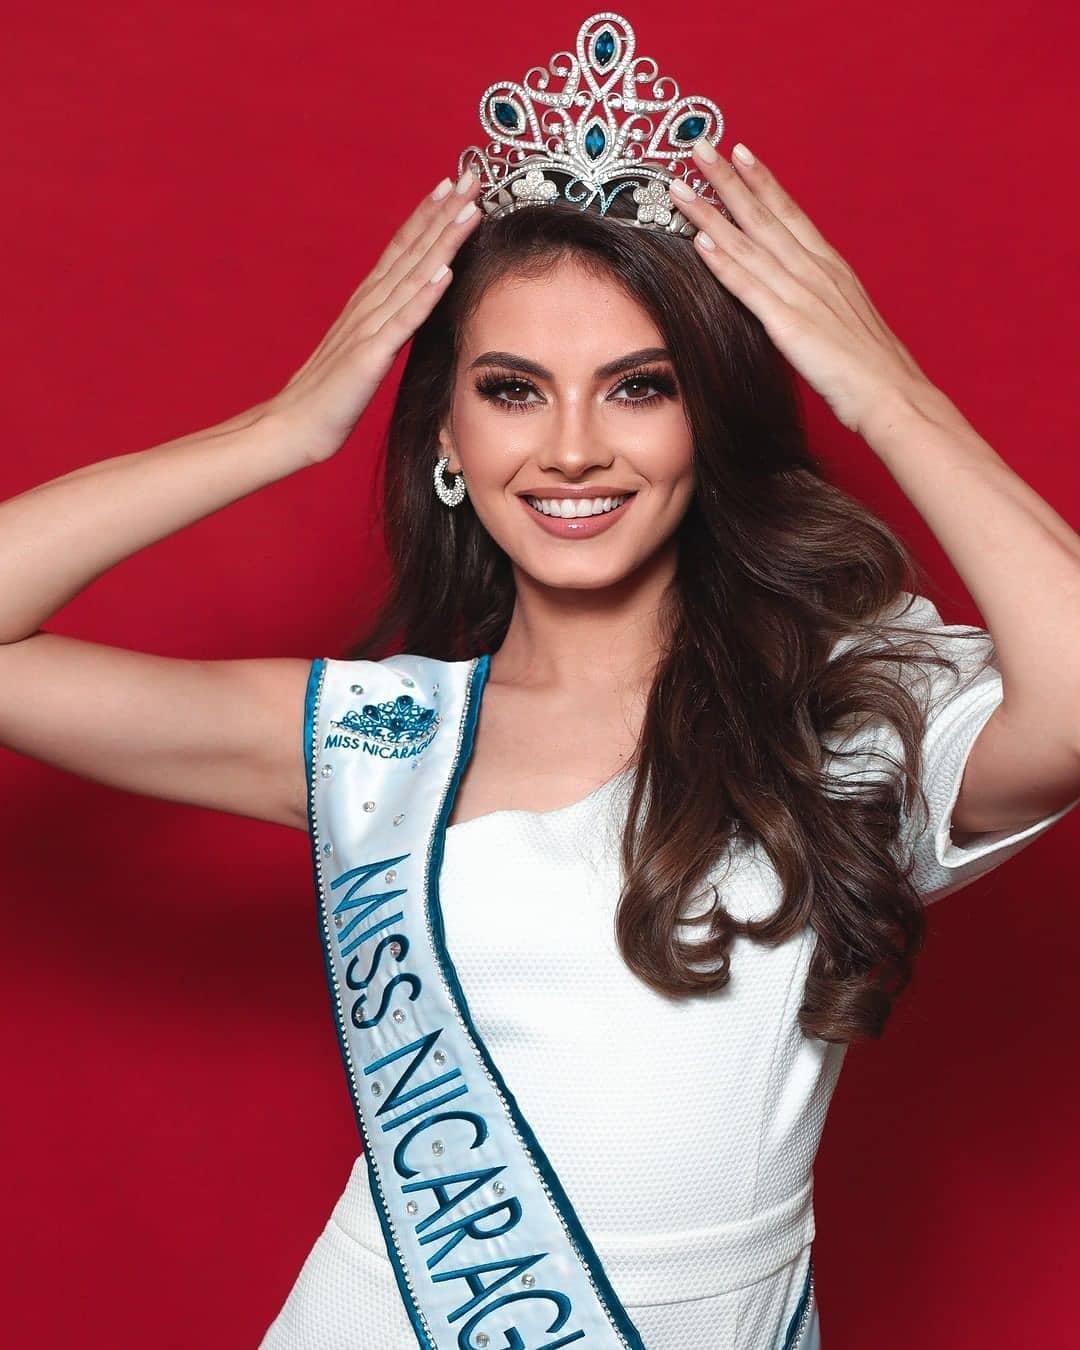 official de miss nicaragua 2020. UDnxbw